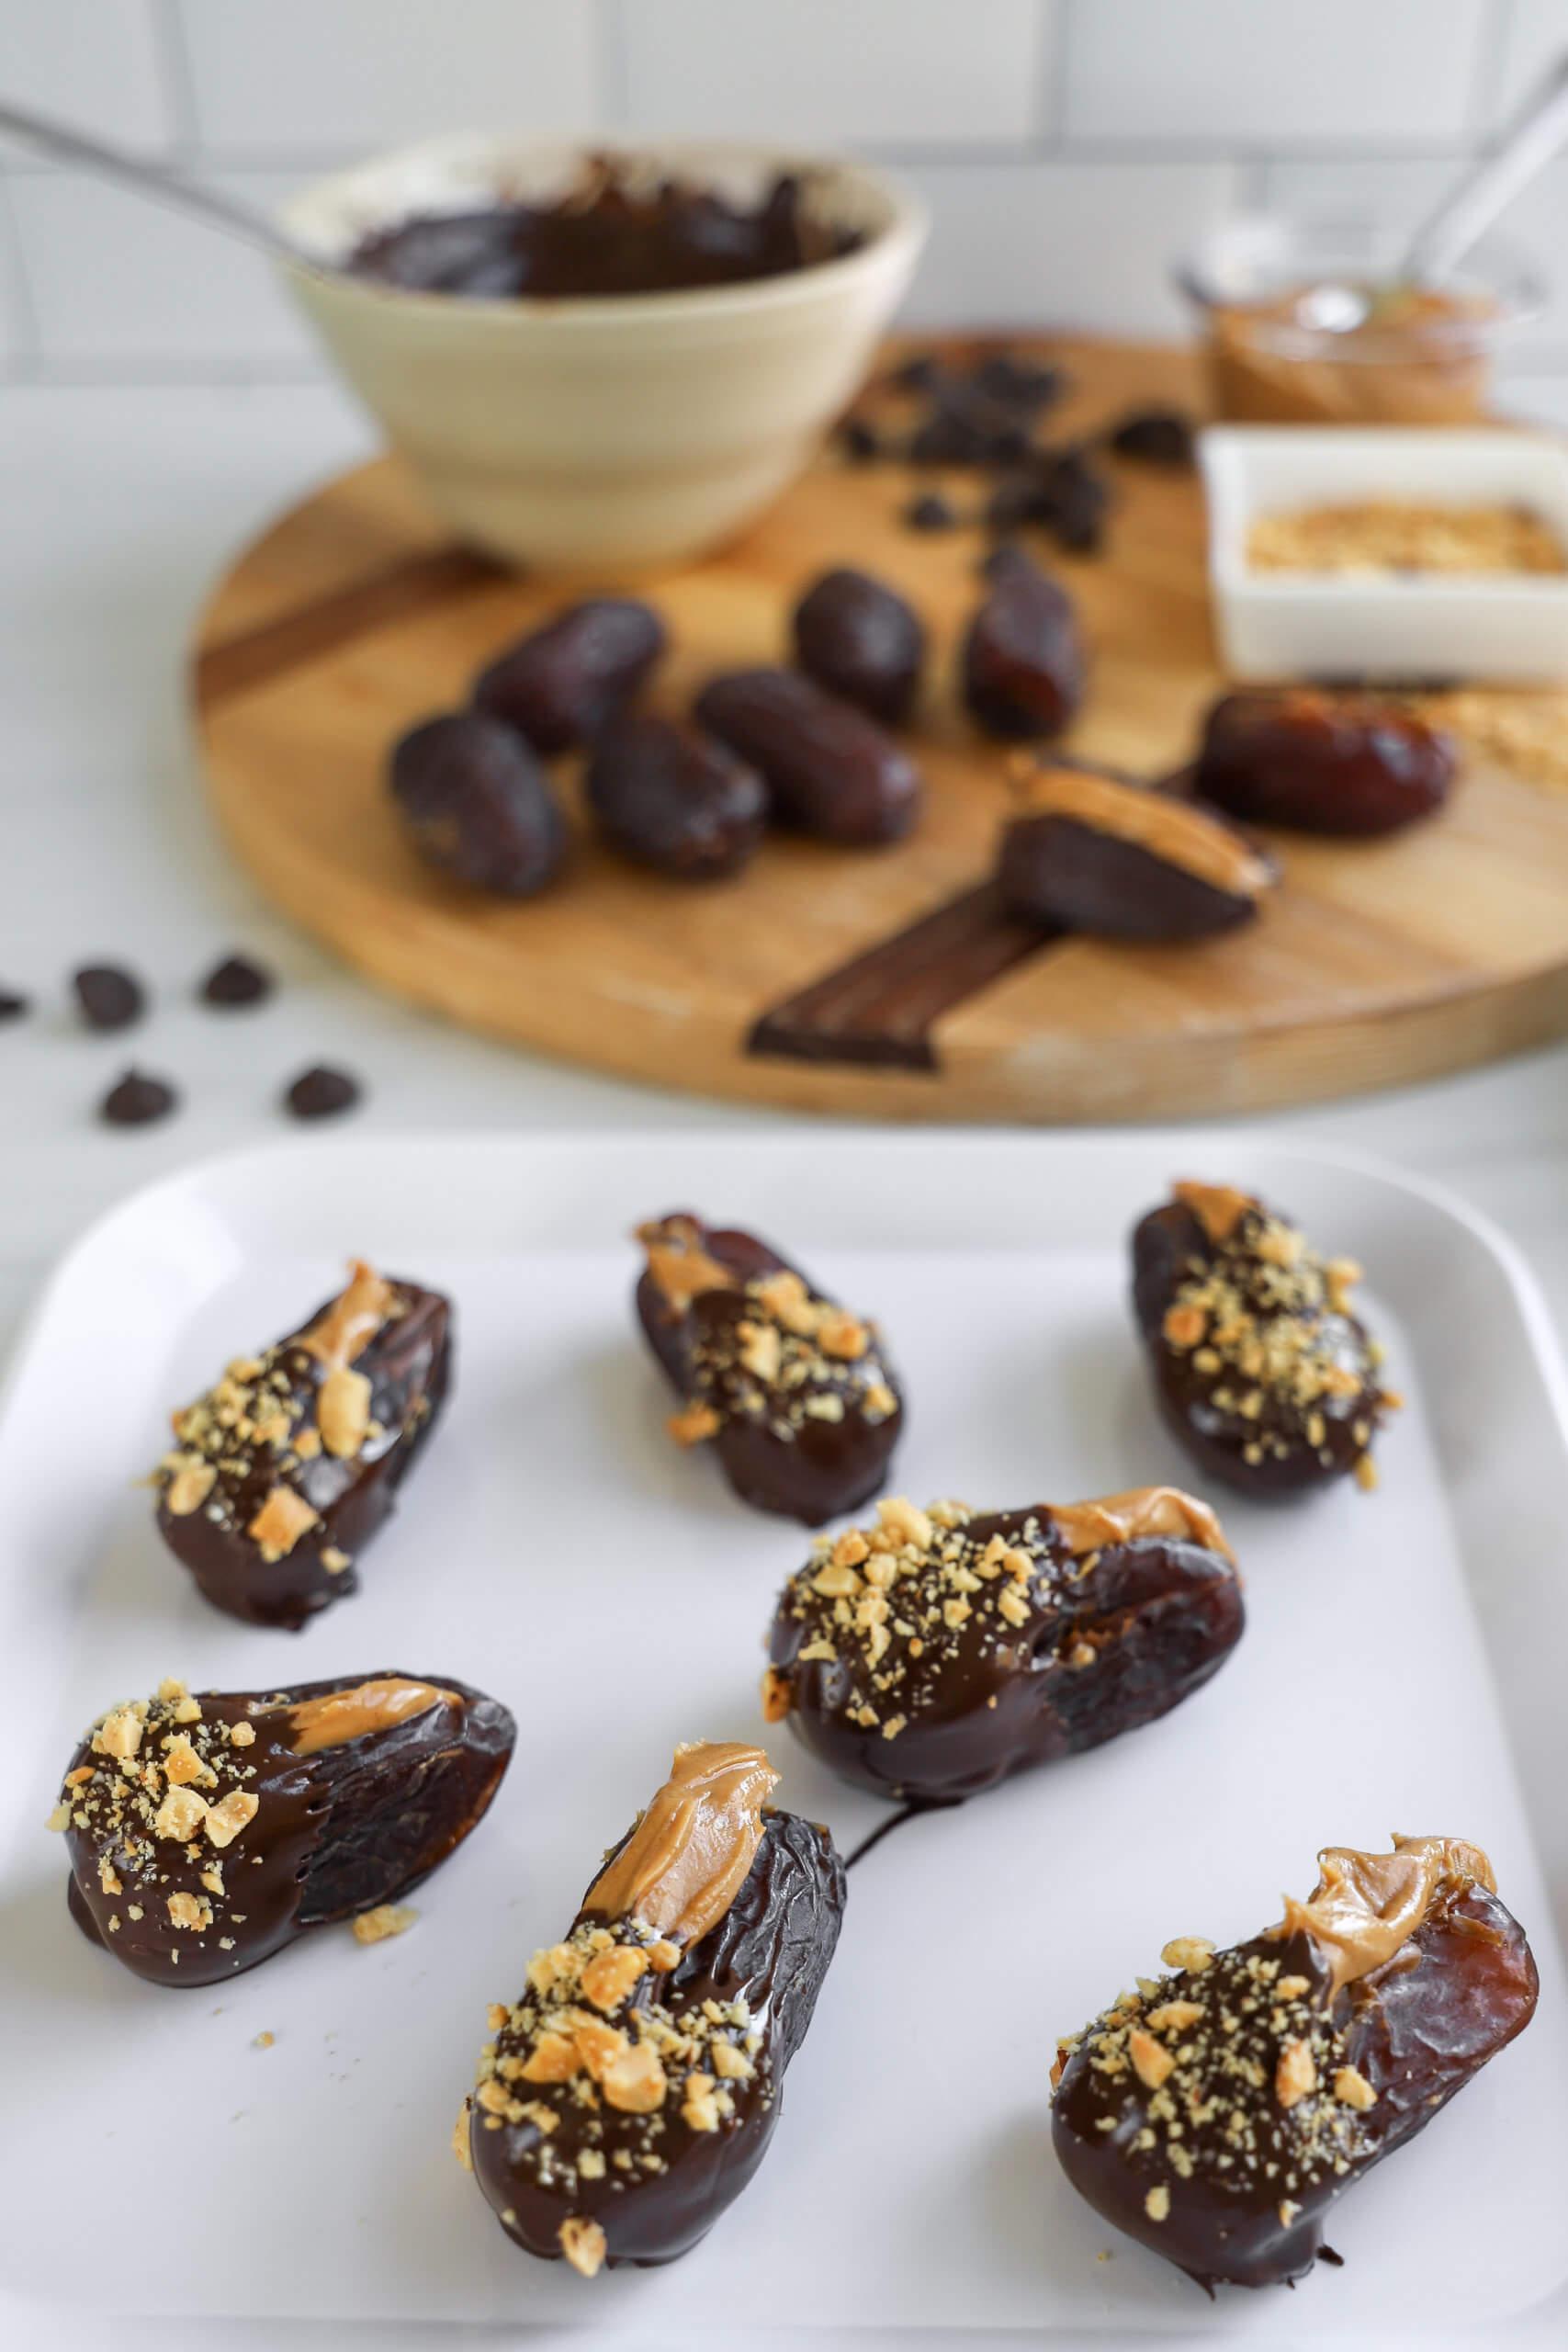 Making Chocolate-Dipped Peanut Butter Stuffed Dates